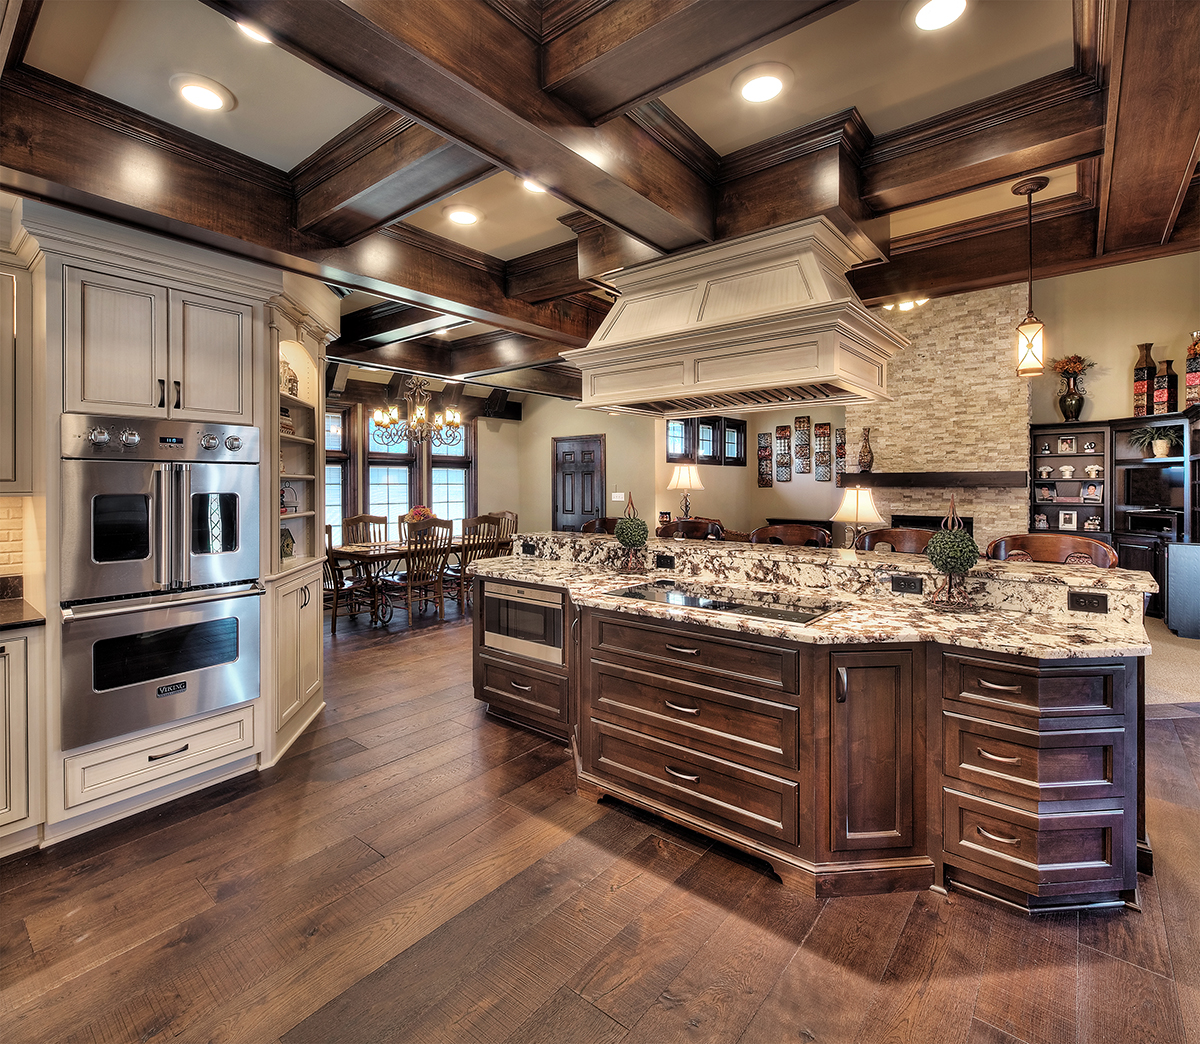 Whole House Design Ideas: 2018 Master Design Awards: Whole House Less Than $300,000